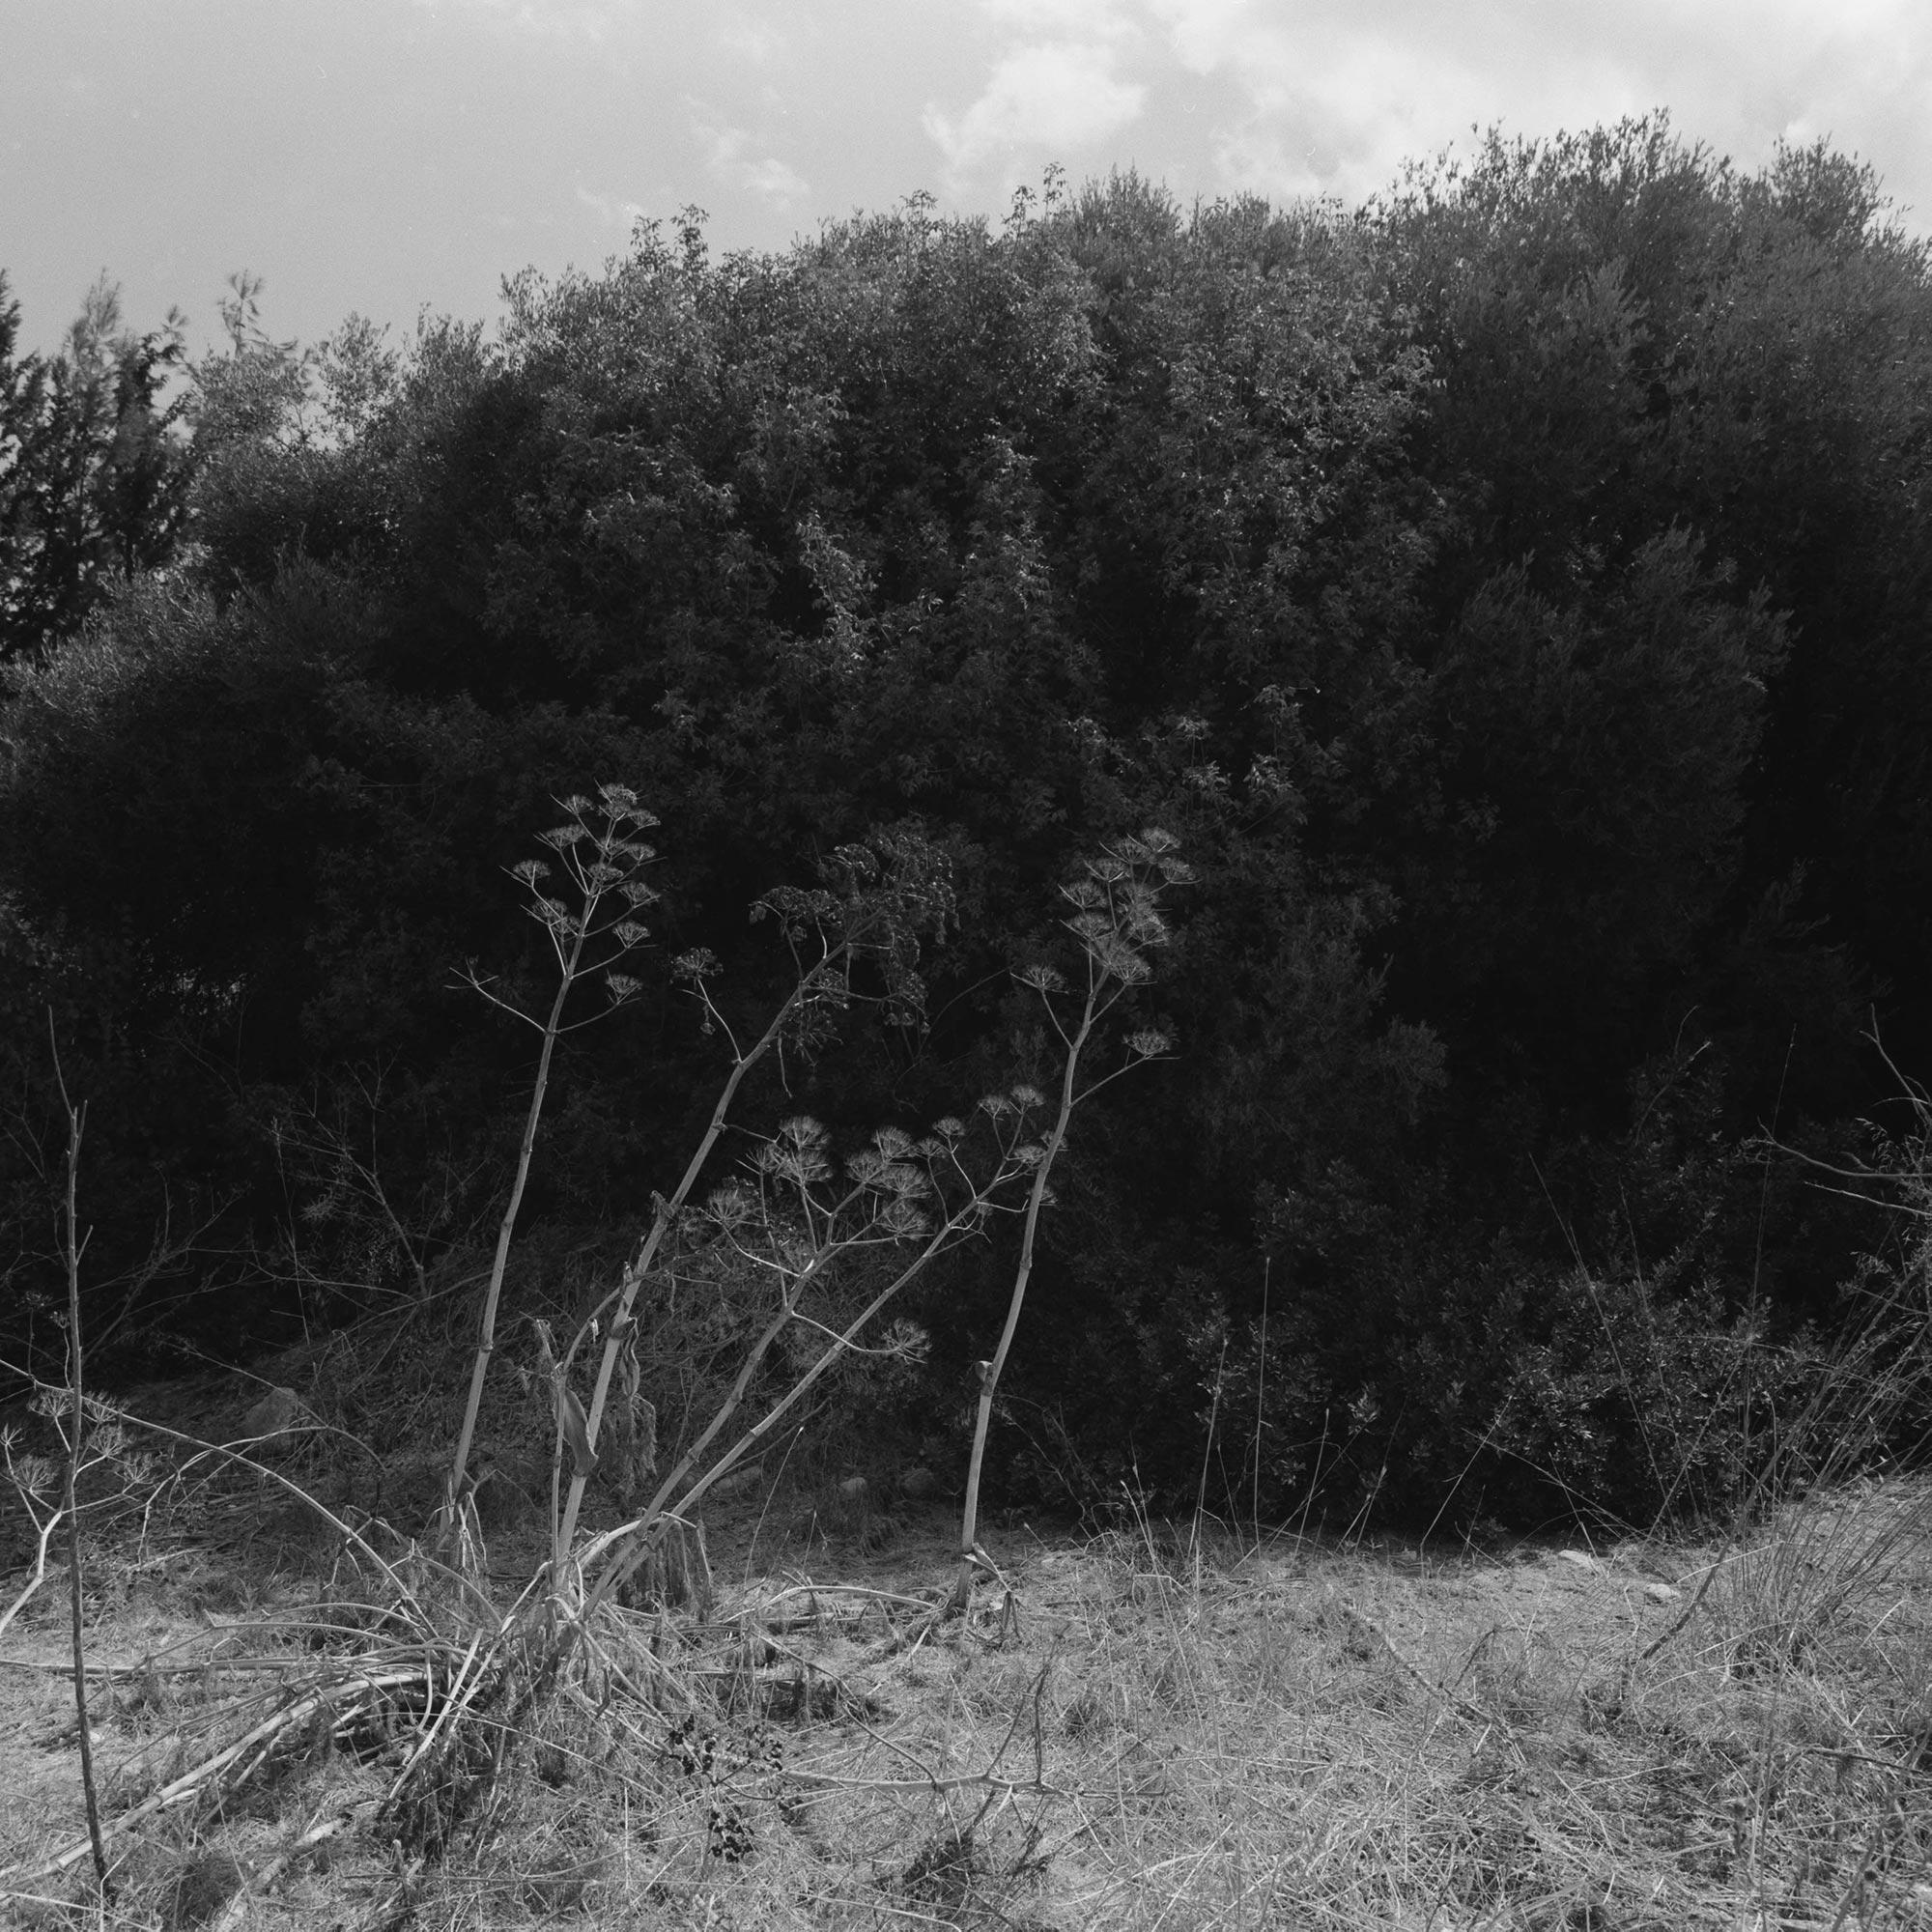 Native Plants of Northern Cyprus